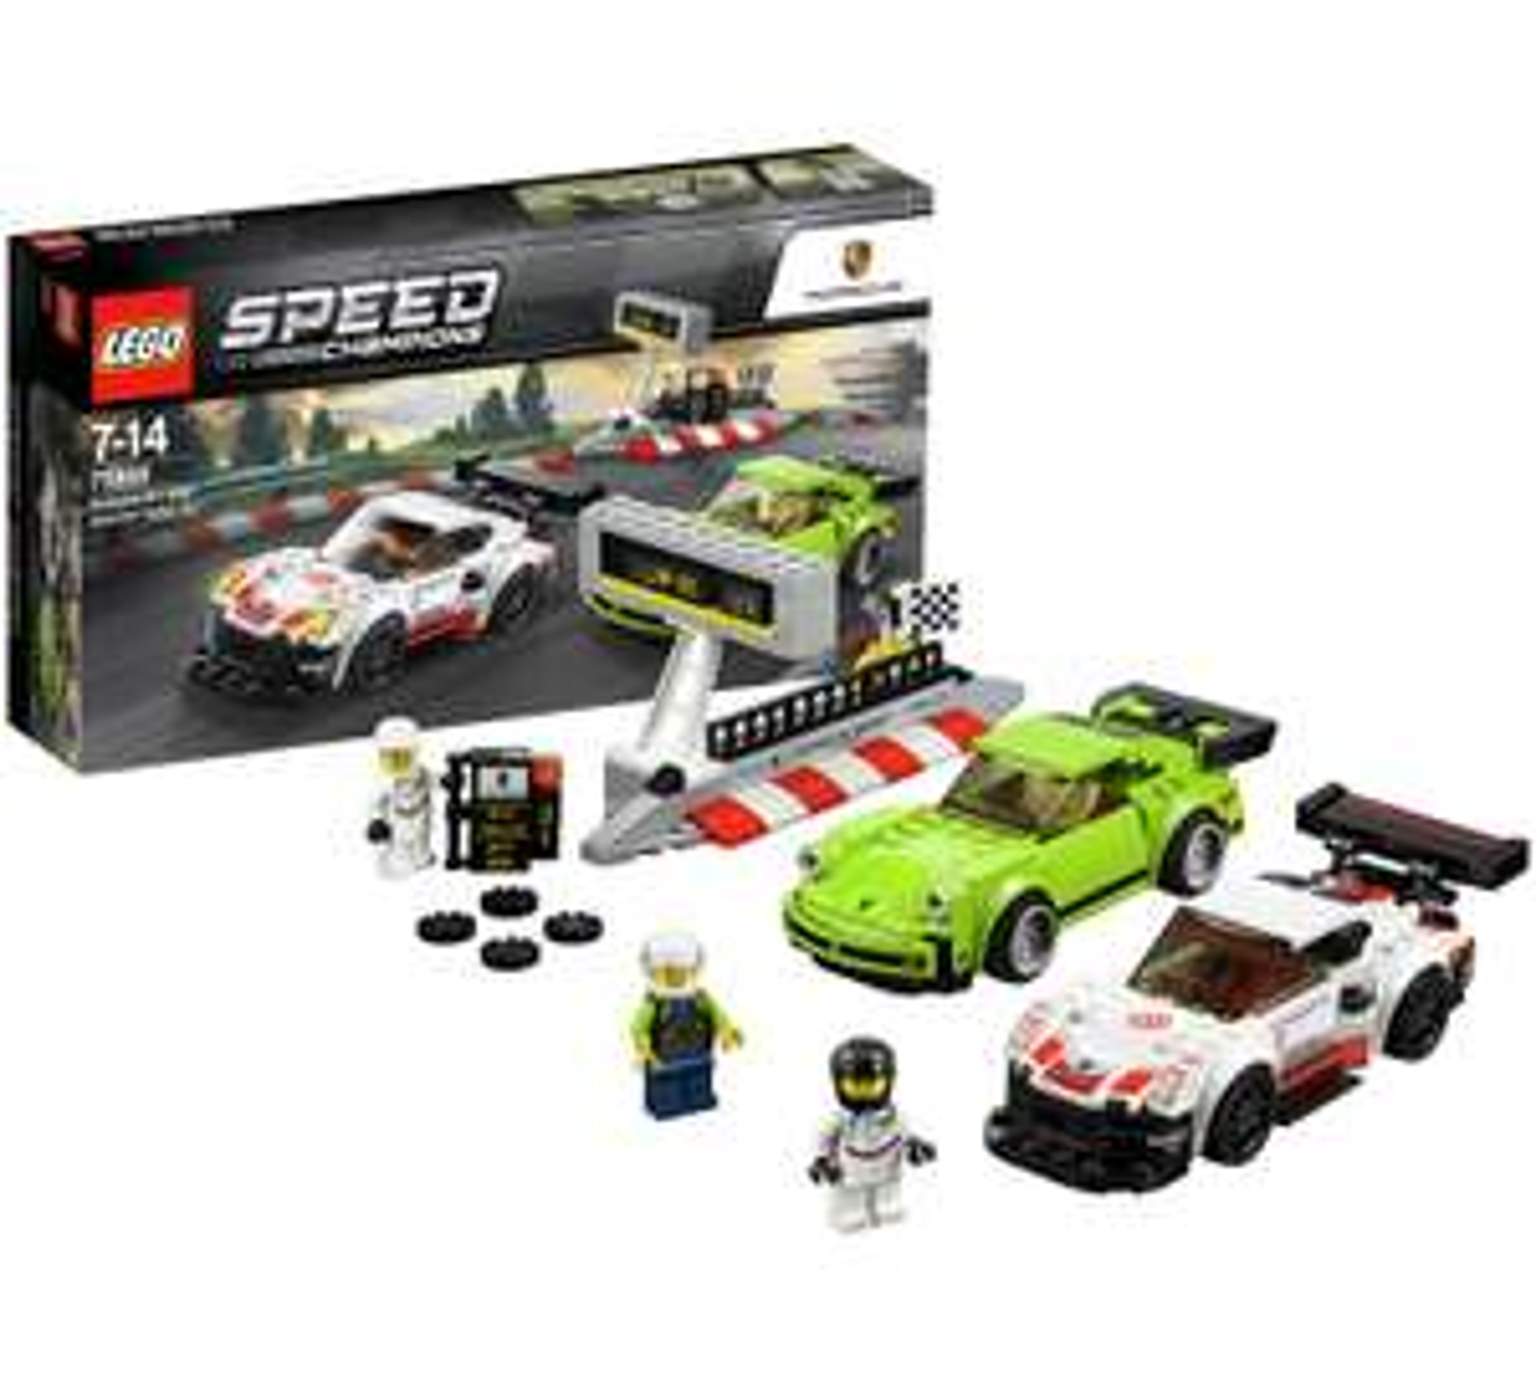 Lego Speed Champions 75888 Porsche 911 £22.99 / 75883 Mercedes Petronas £56.49 / 75889 Ferrari Ultimate Garage £59.99 @ Argos